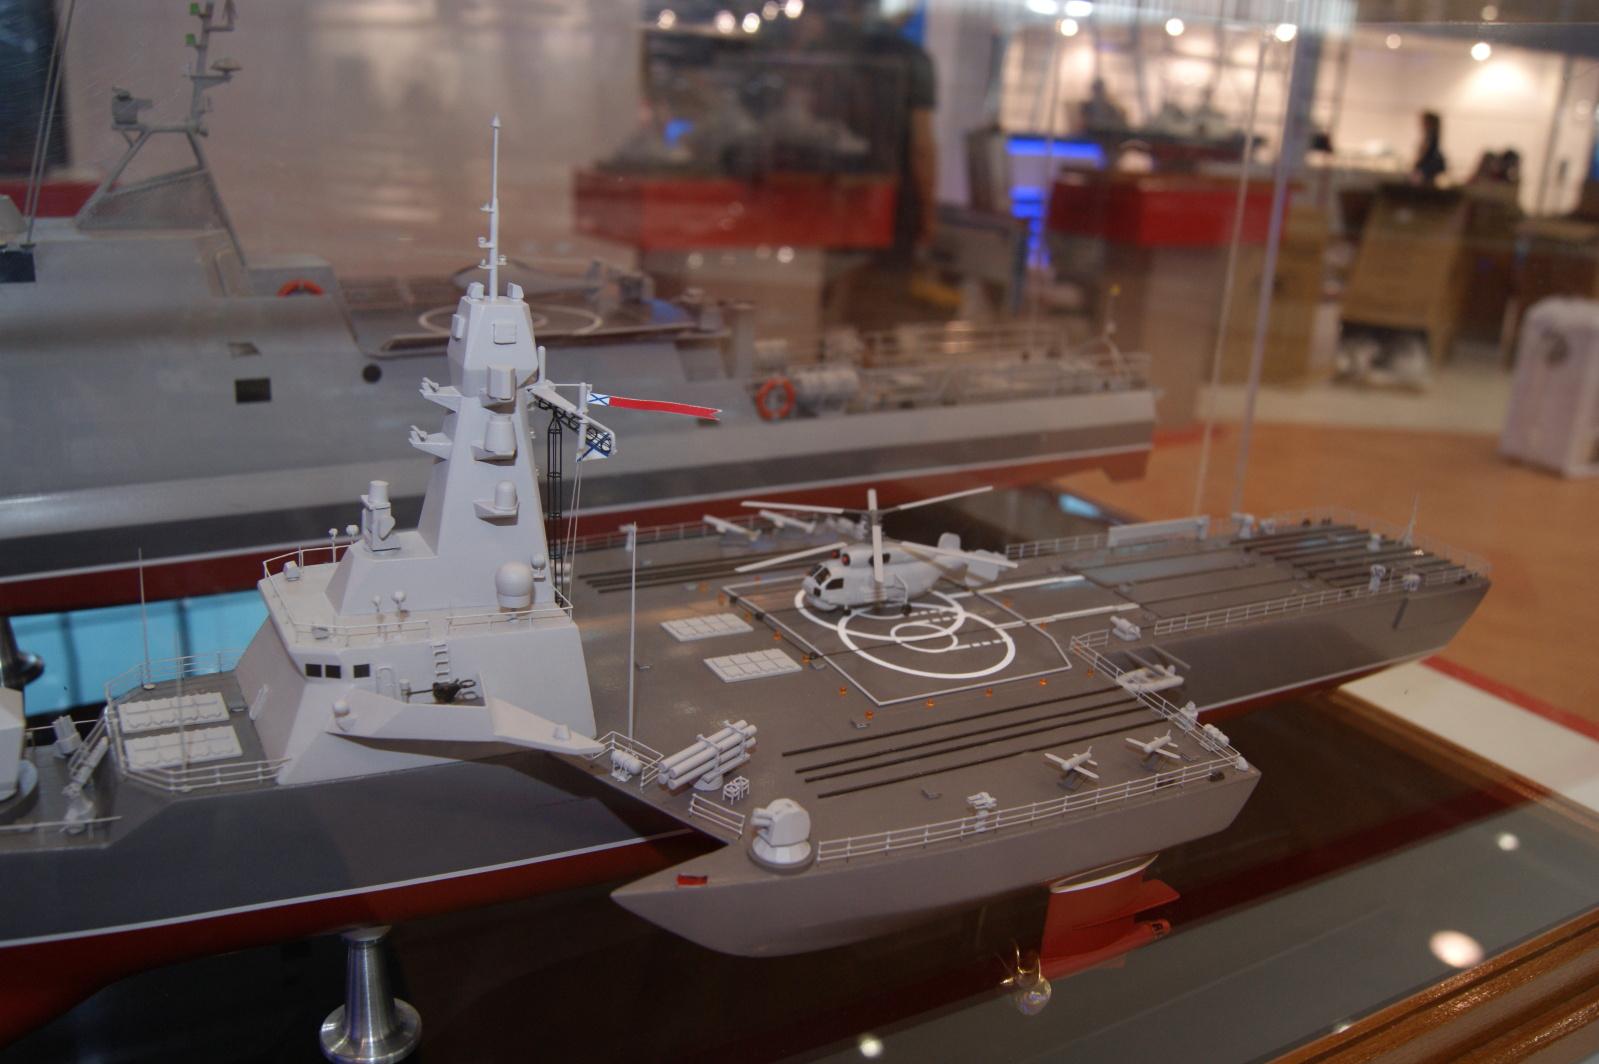 2015 Naval Show - St. Petersburg 2itsj8m